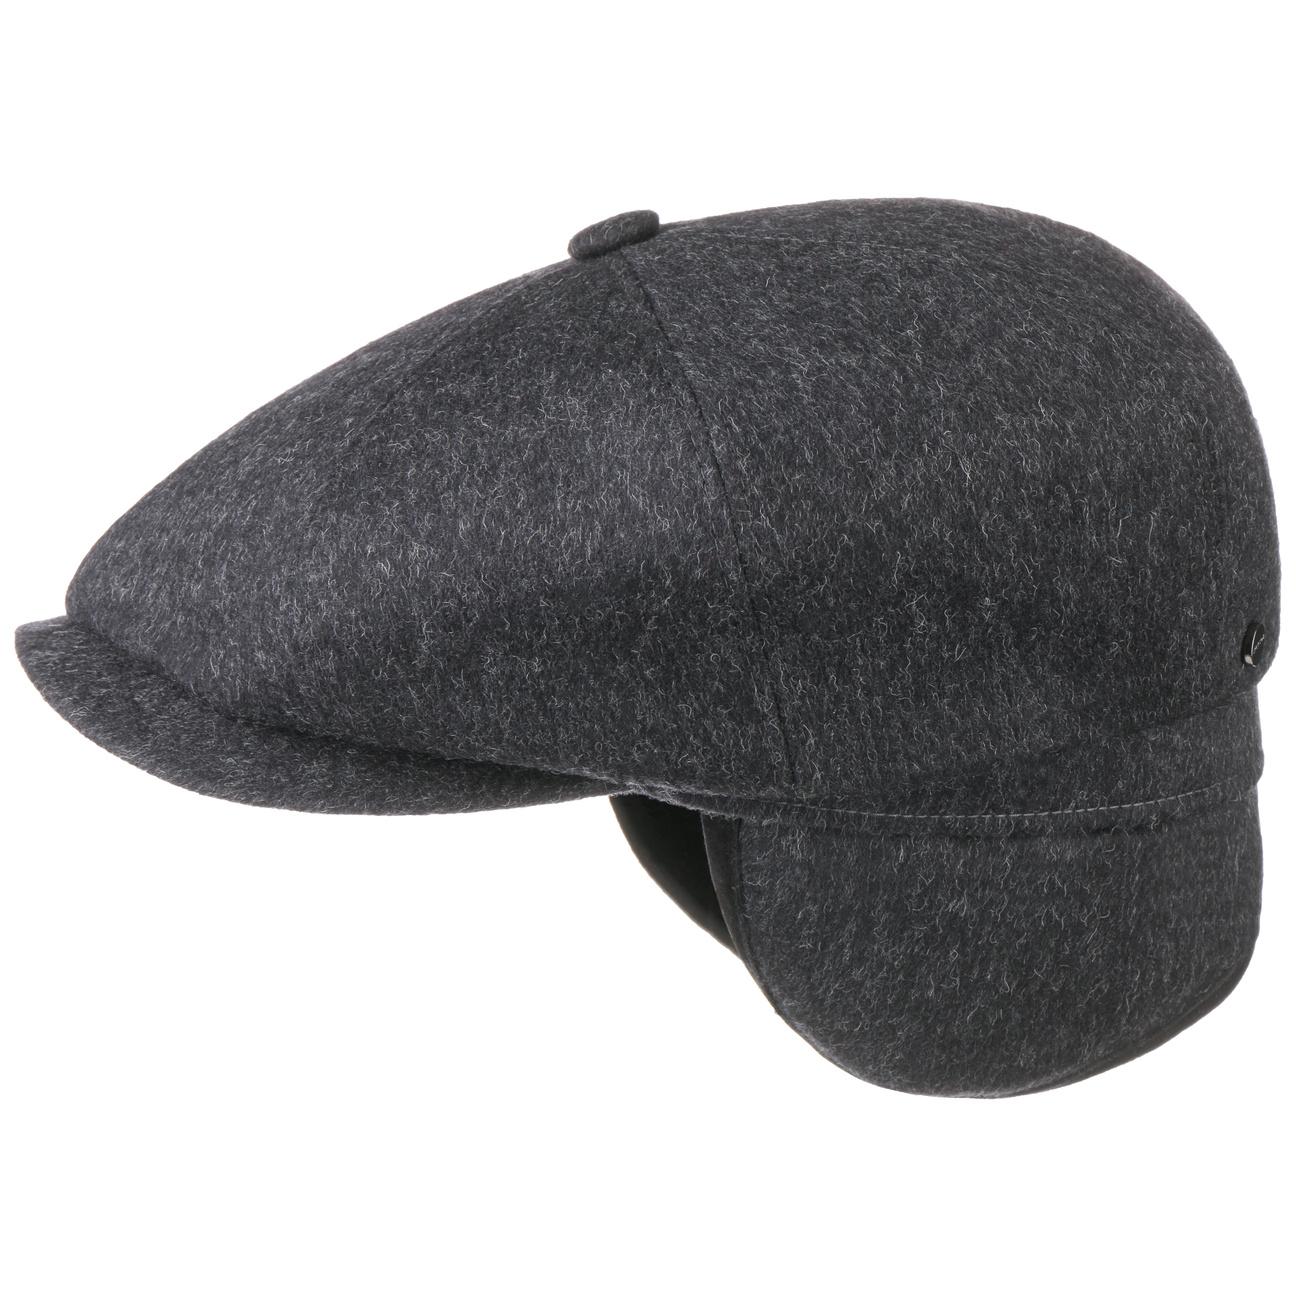 gorra-hatteras-de-loden-by-stetson, 129.00 EUR @ sombreroshop-es